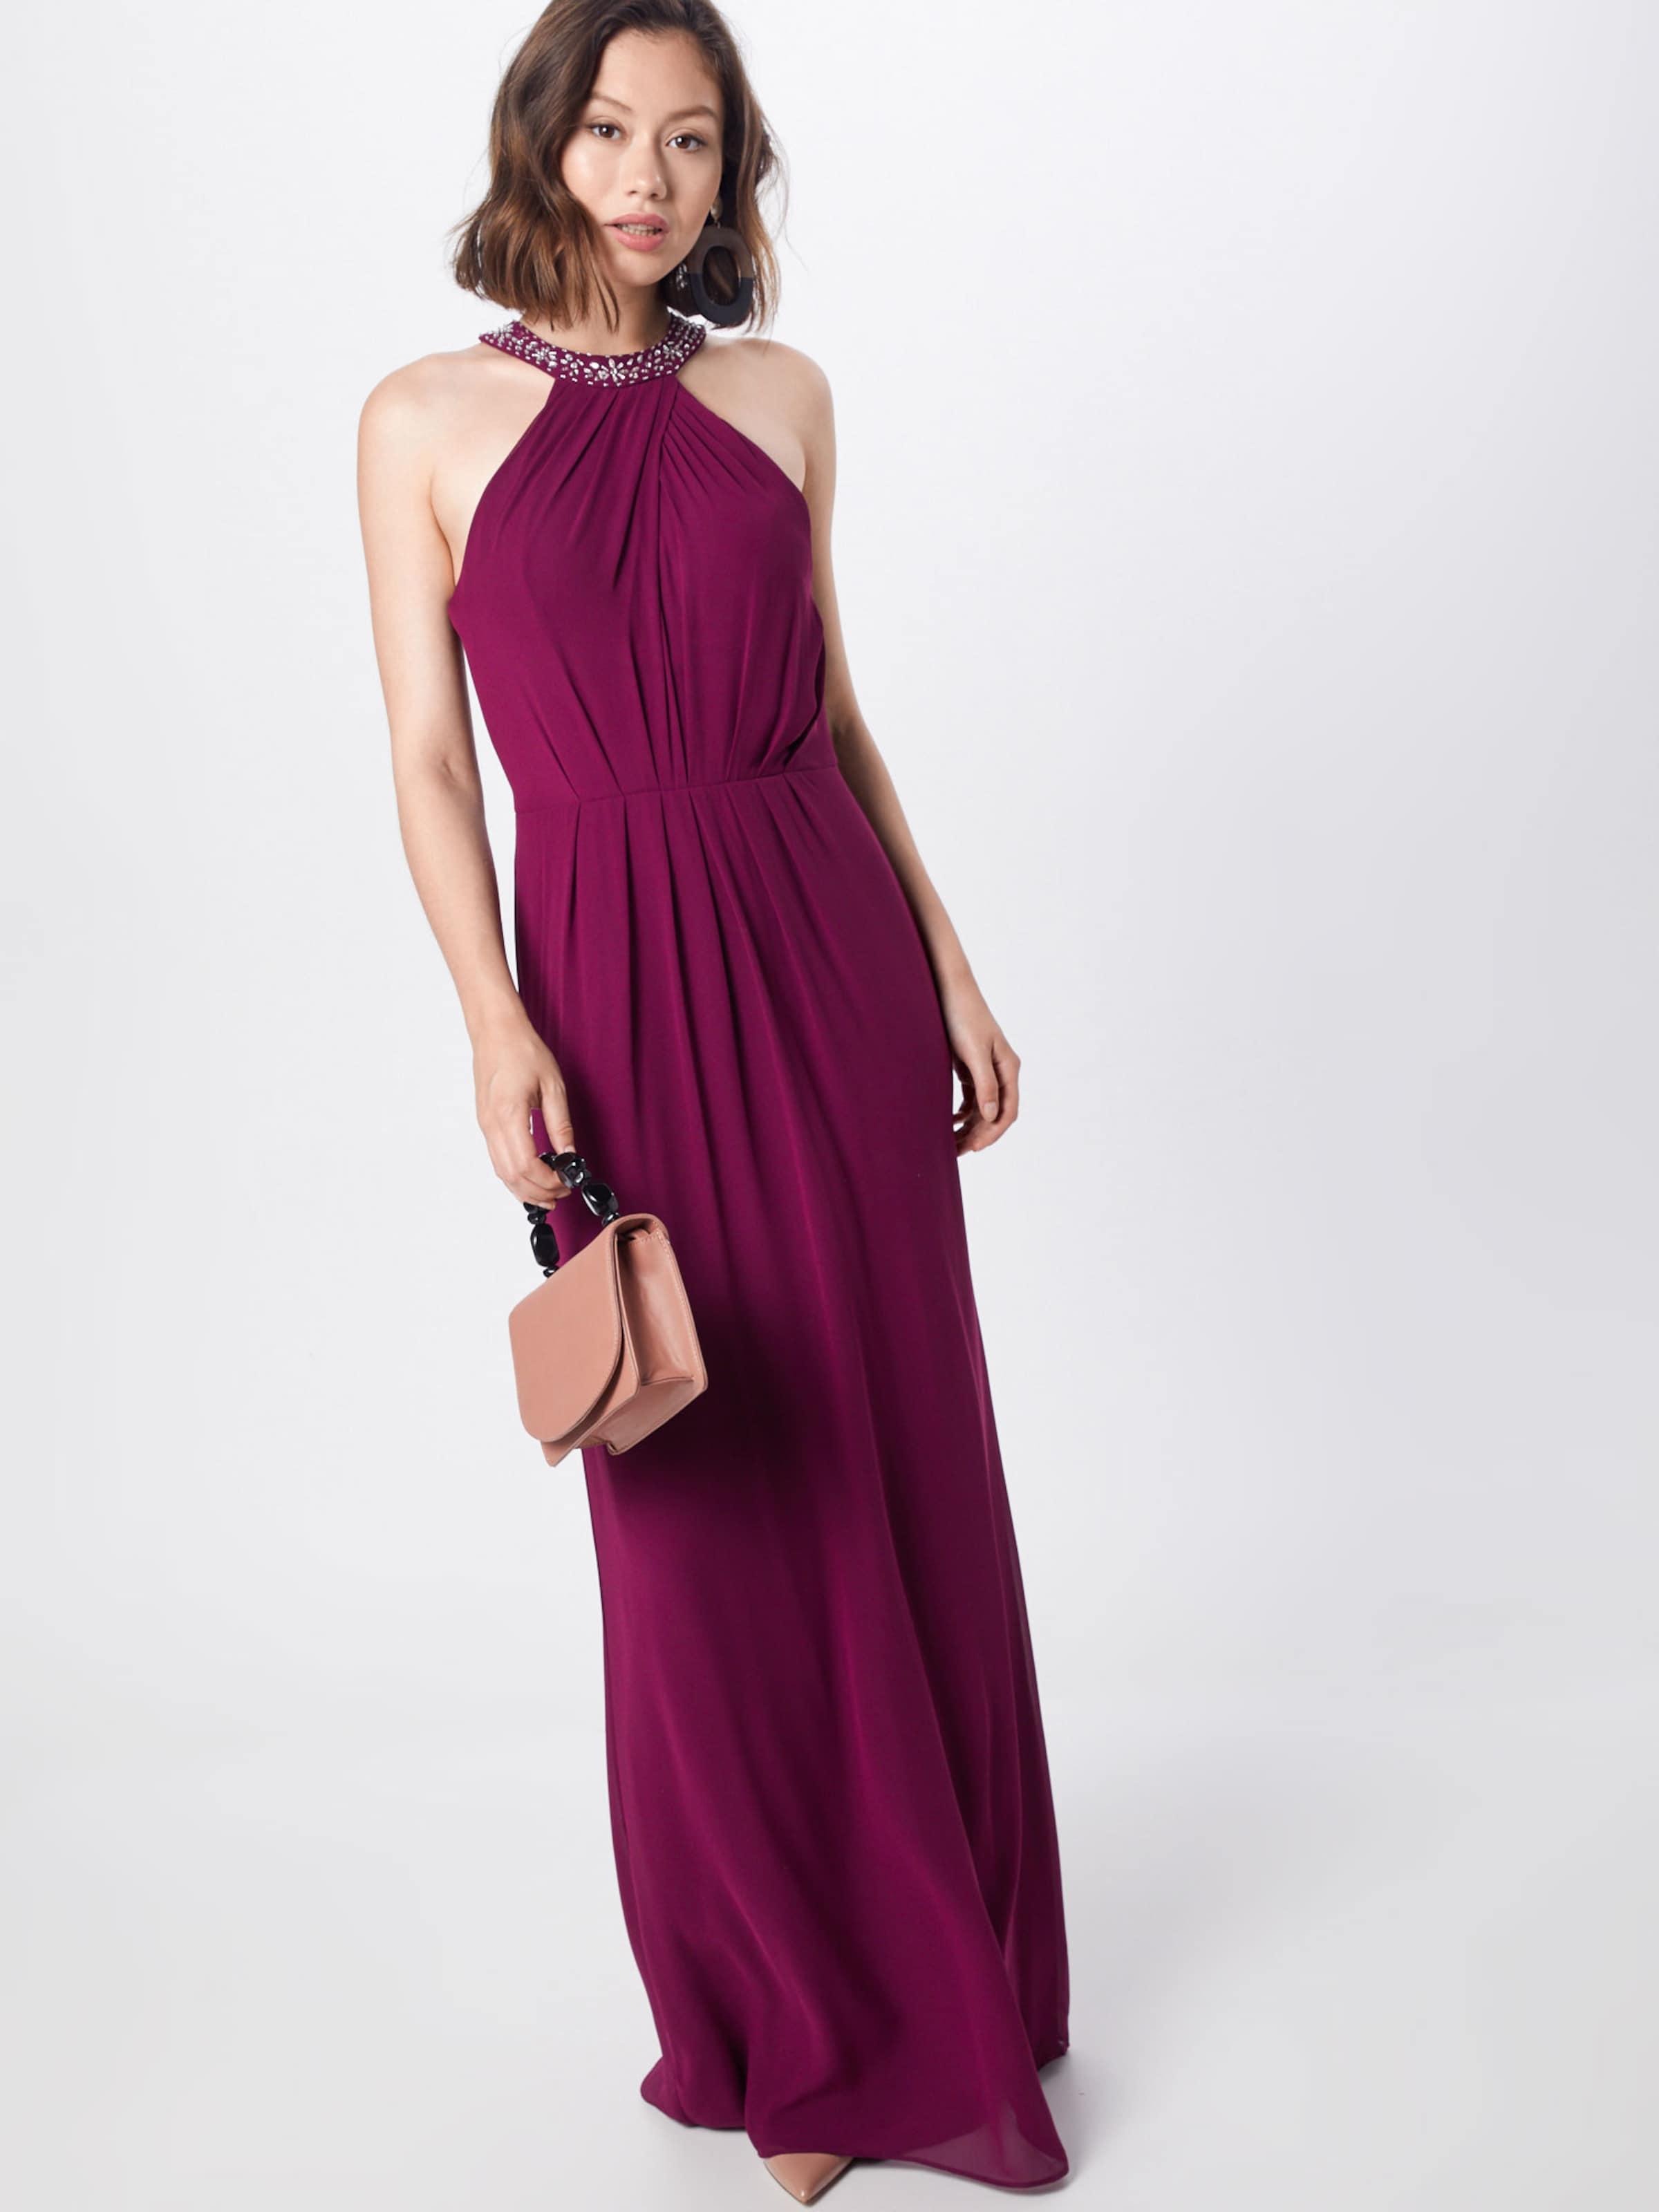 De Soirée En Star Violet Night Robe OPXZkTiu